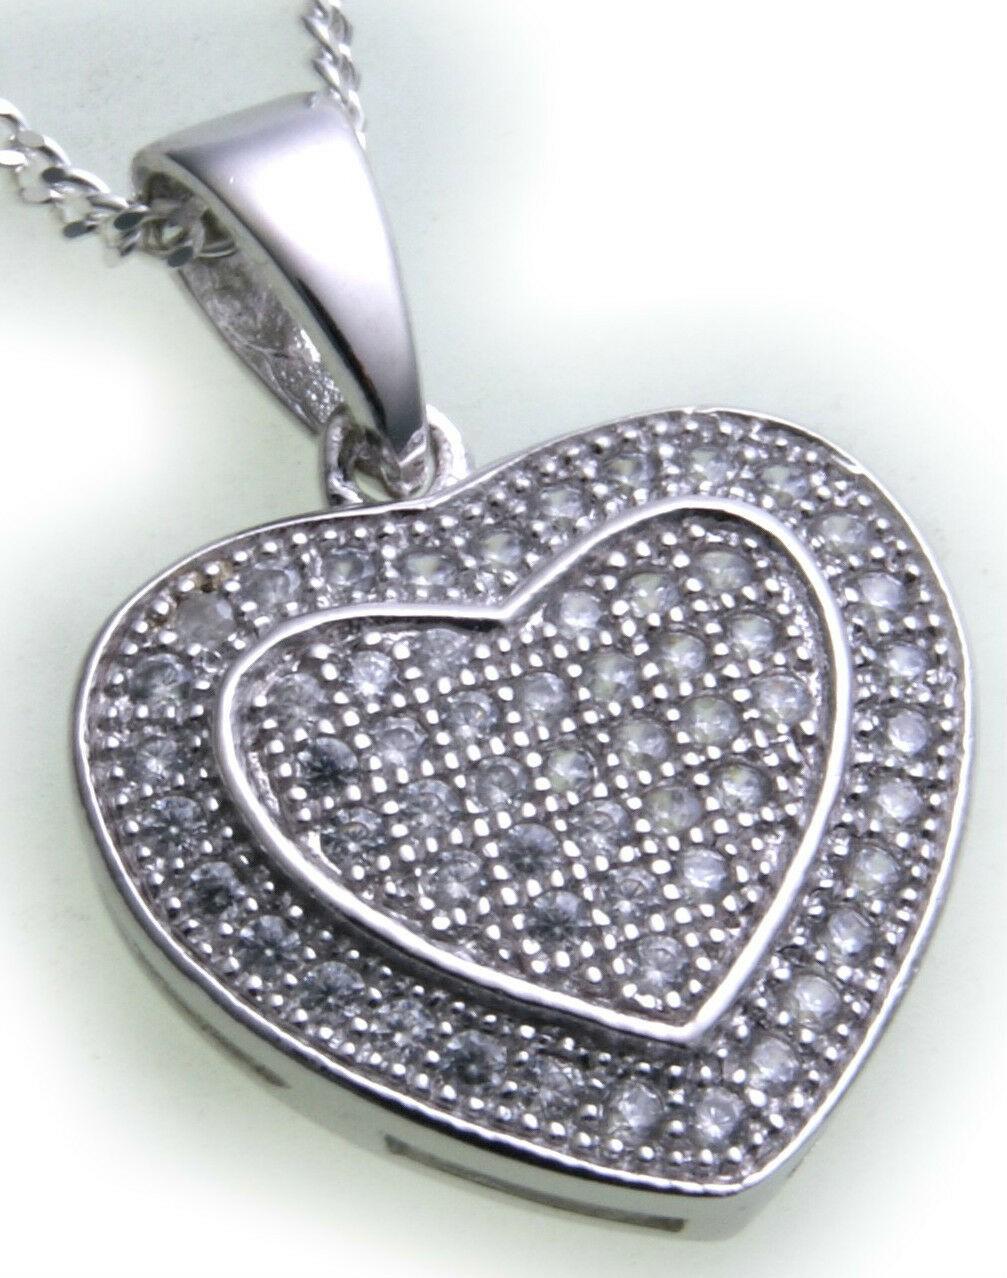 Anhänger Herz echt Silber 925 Sterlingsilber Zirkonia Mikropavee mit Halskette